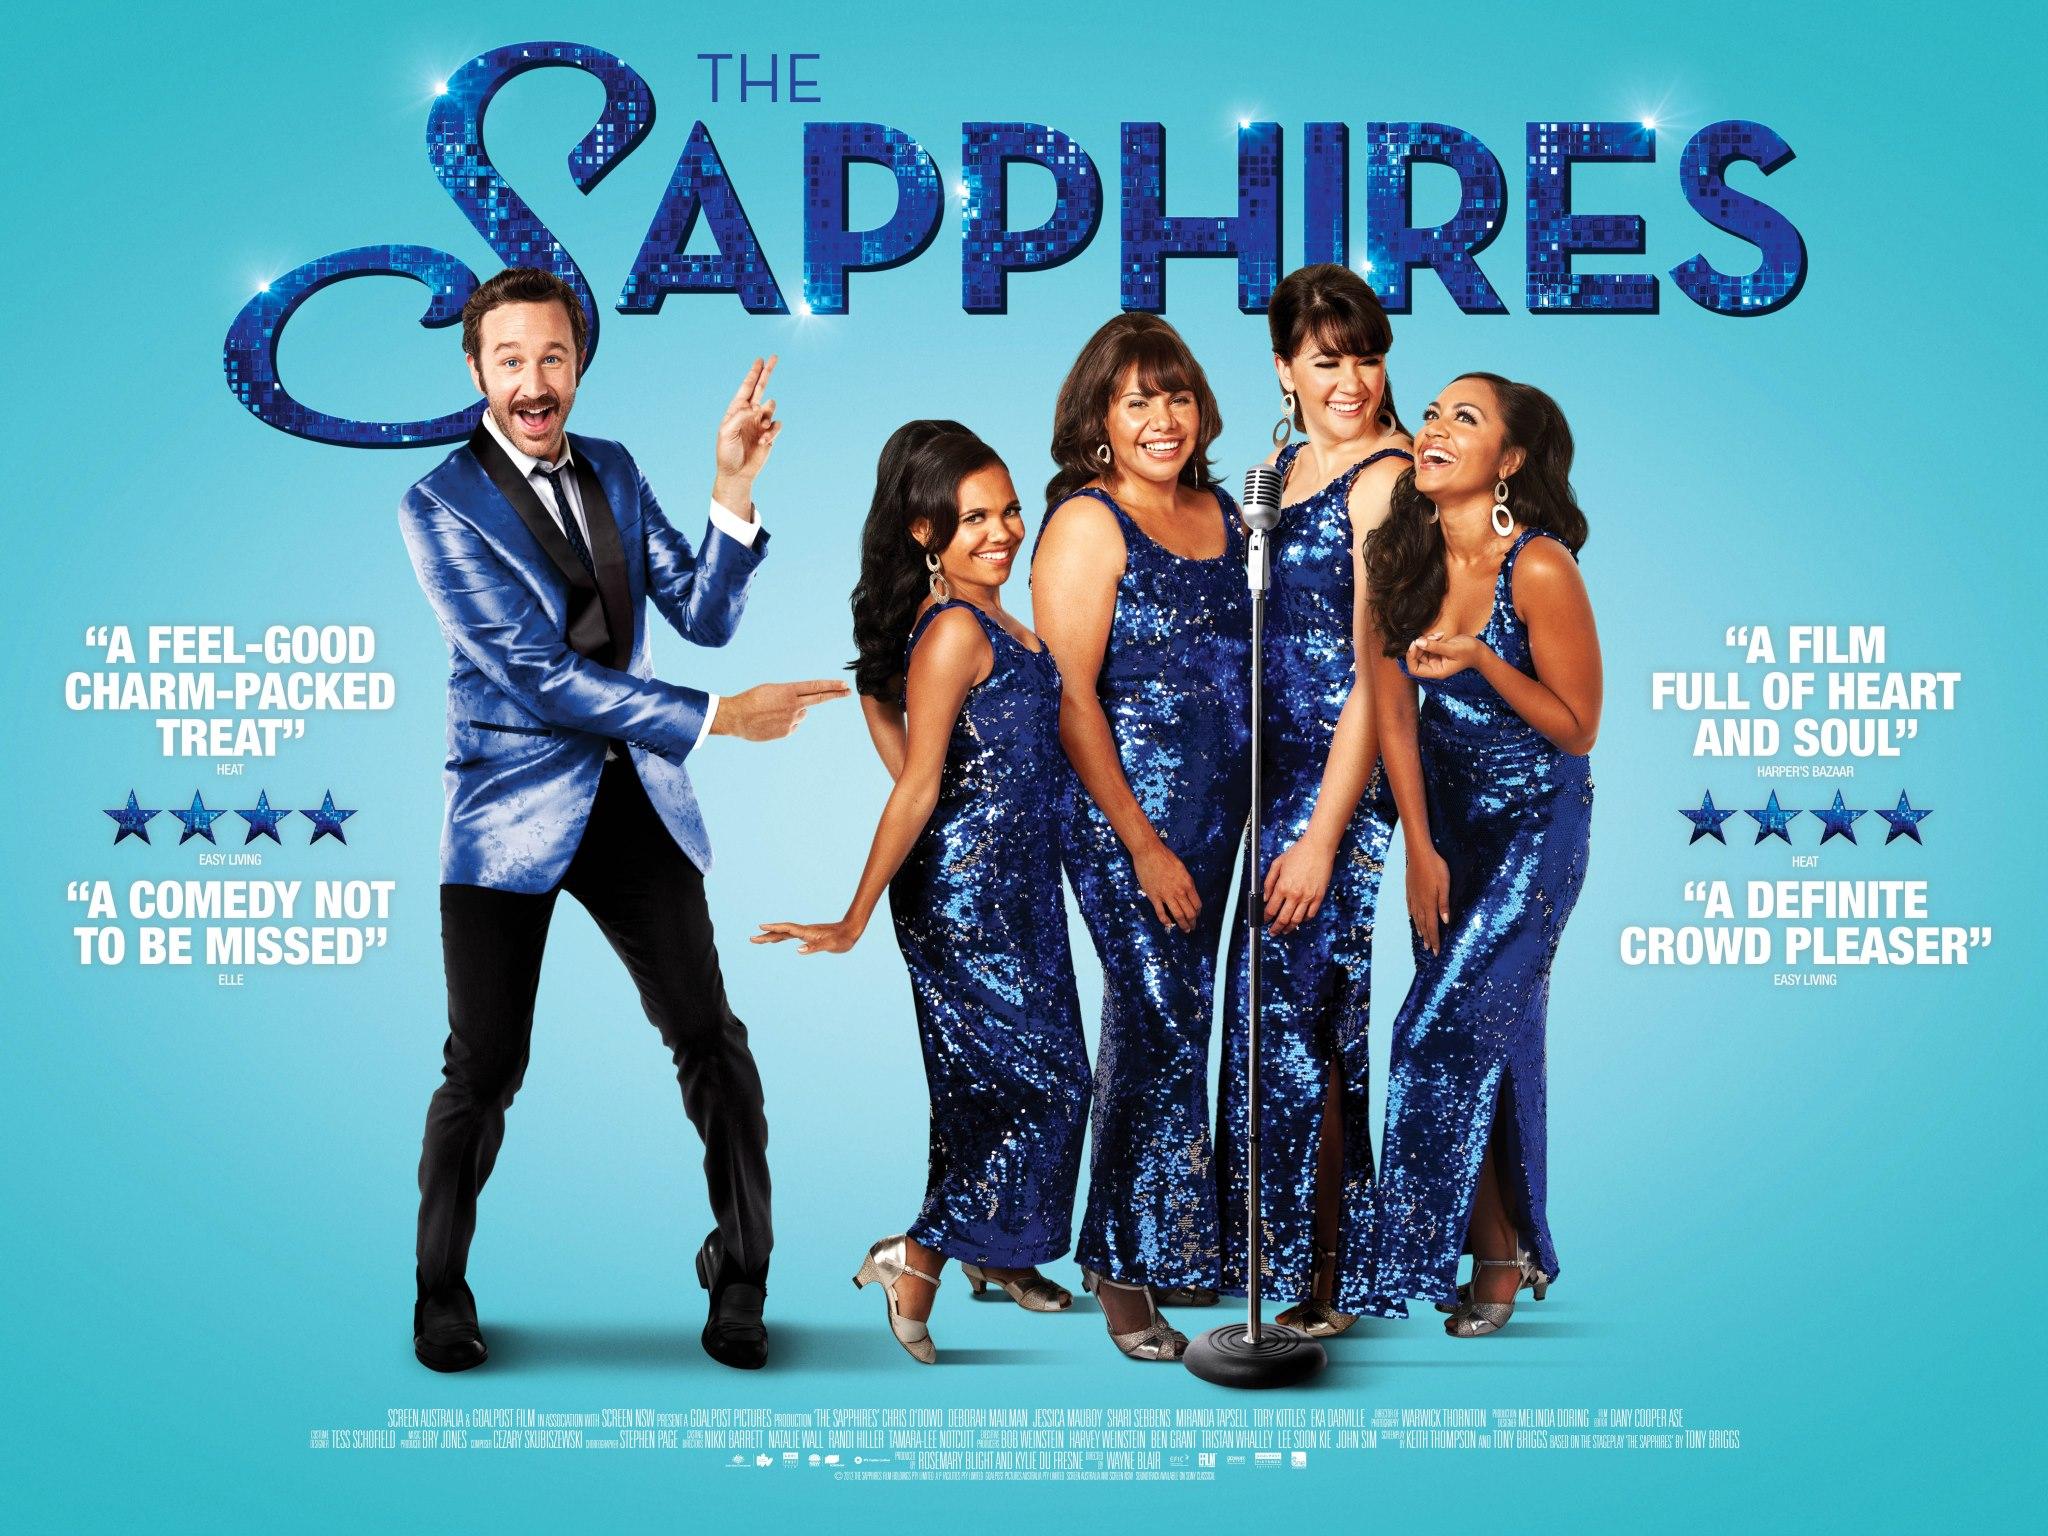 The Sapphires (2012) - Australia